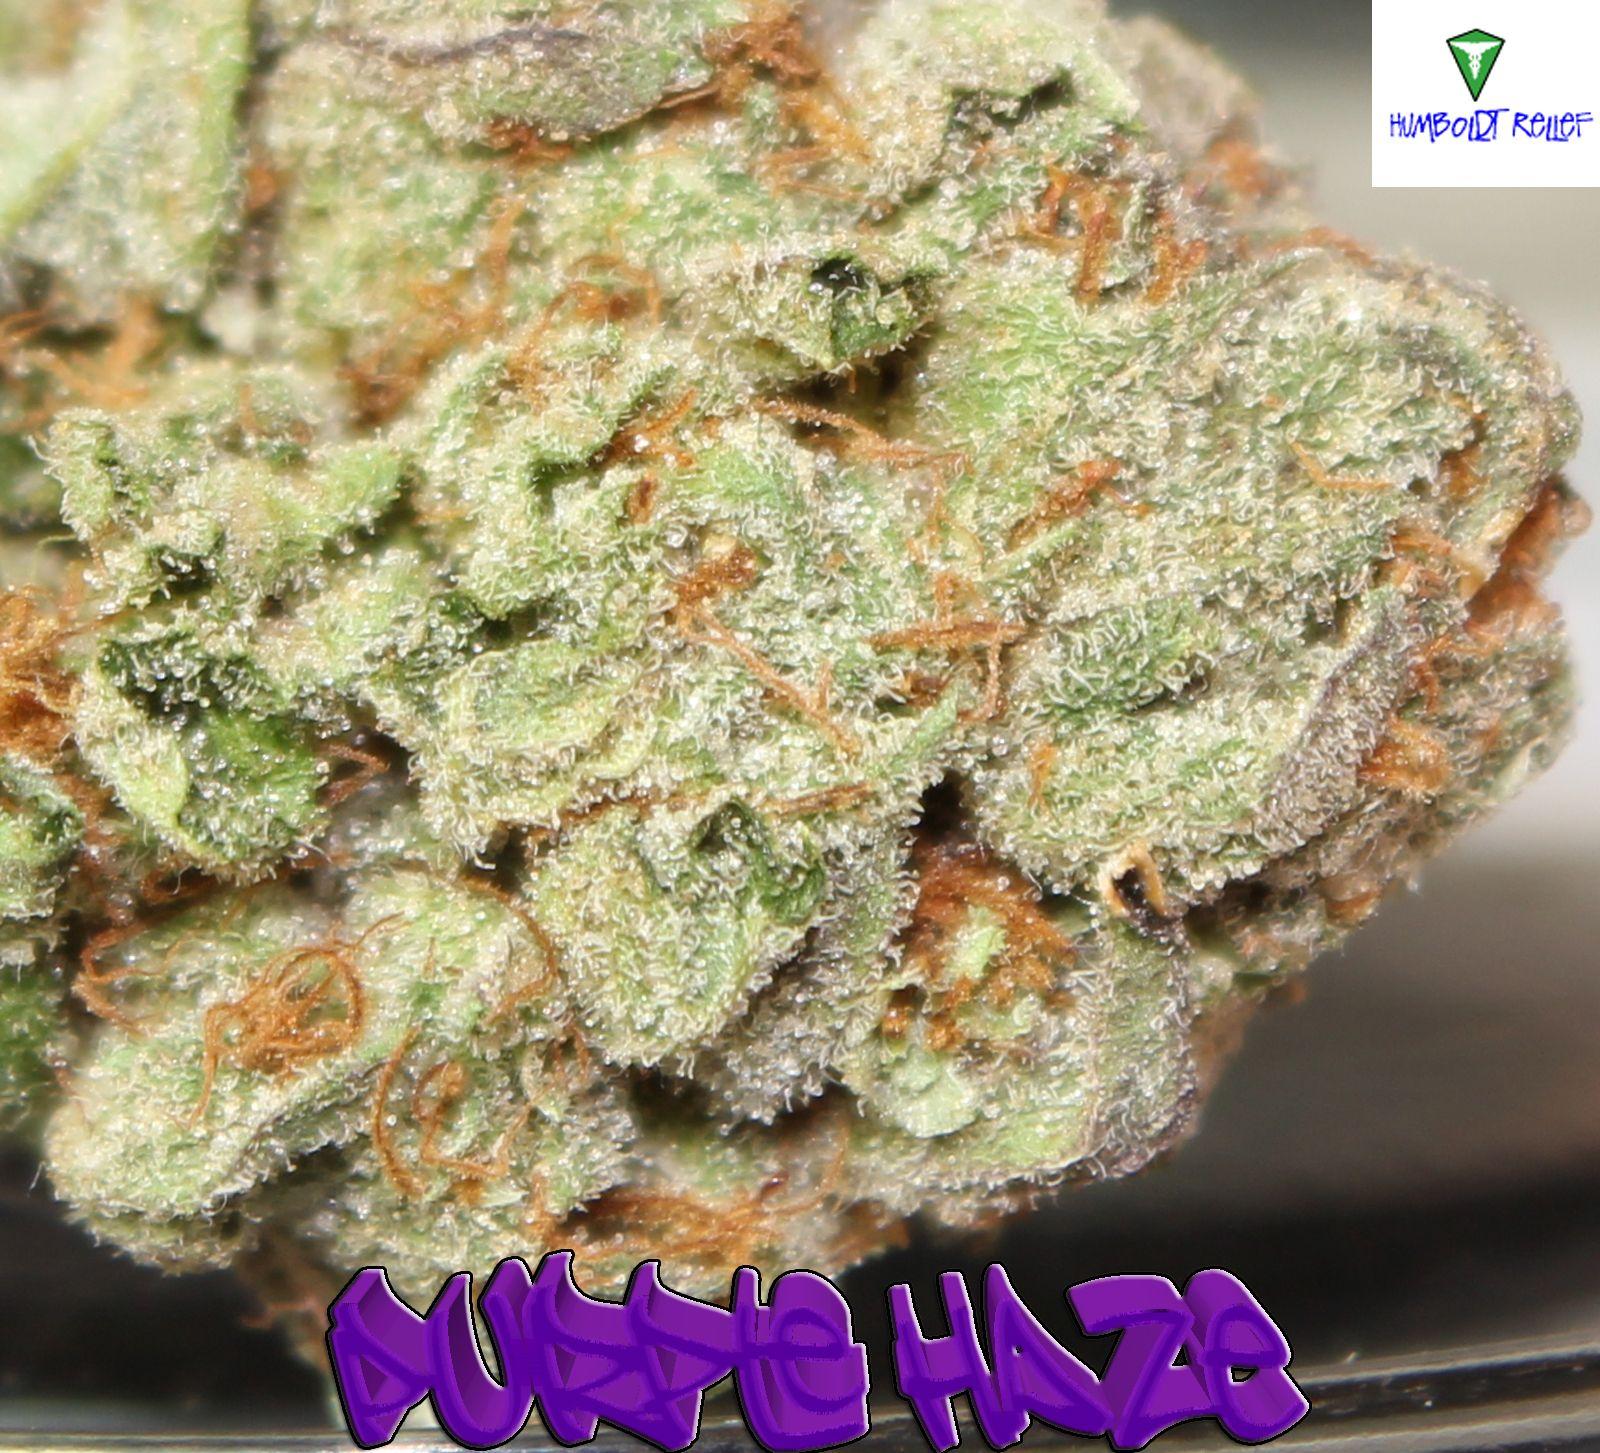 Is Weed Purple Haze Marijuana This is what Zip Grinders were made for!